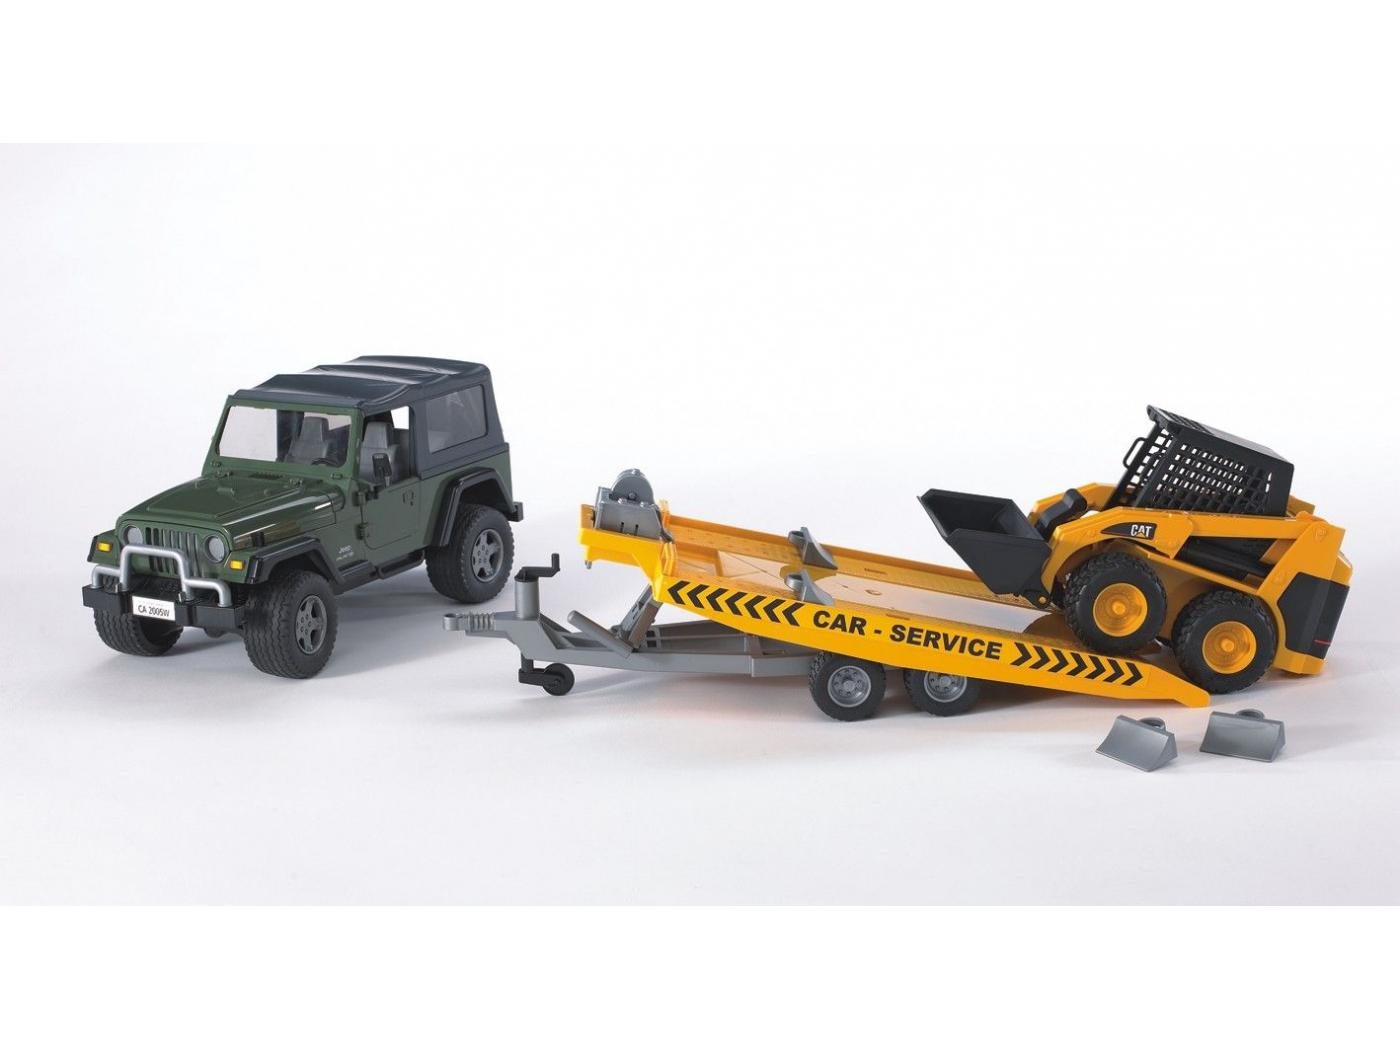 Jeep wrangler unlimited w car carring trailer a cat skid steer loader